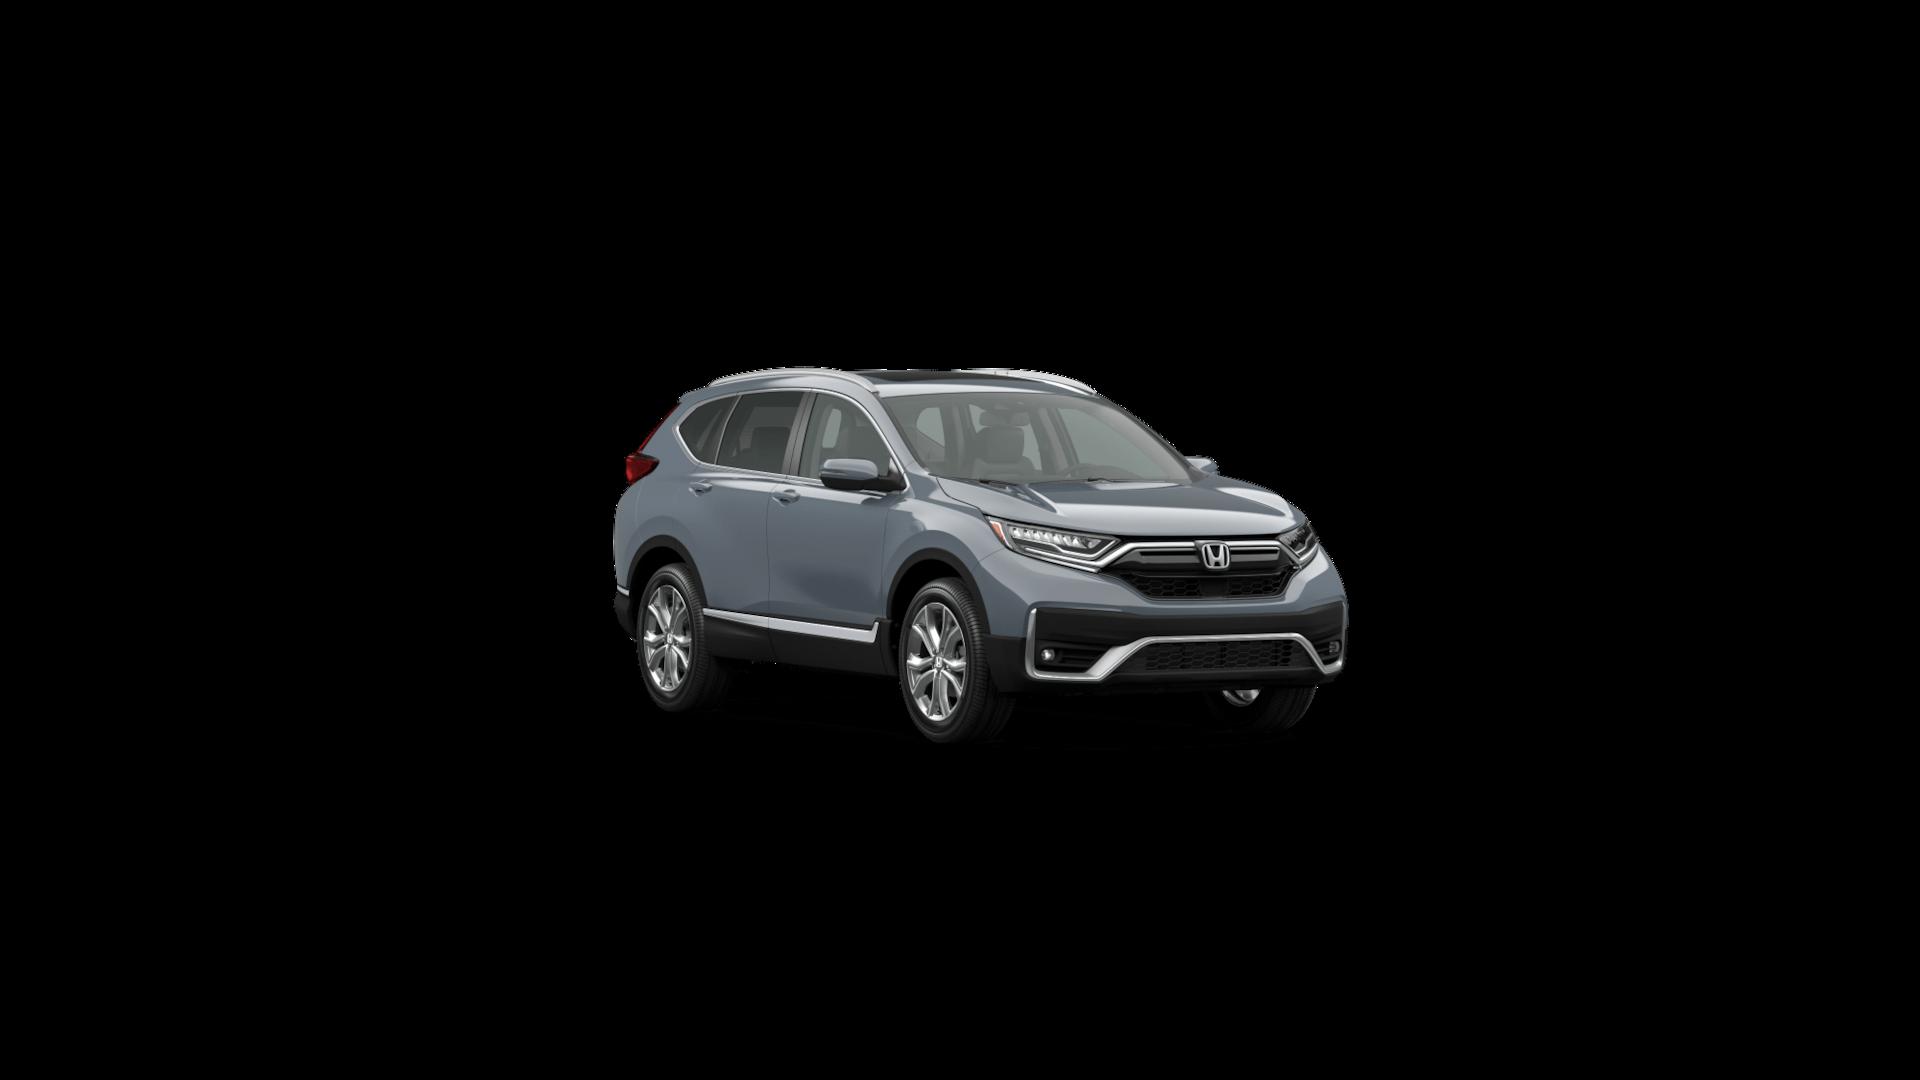 2021 Honda Cr V The Midsize Turbocharged Or Hybrid Suv Honda